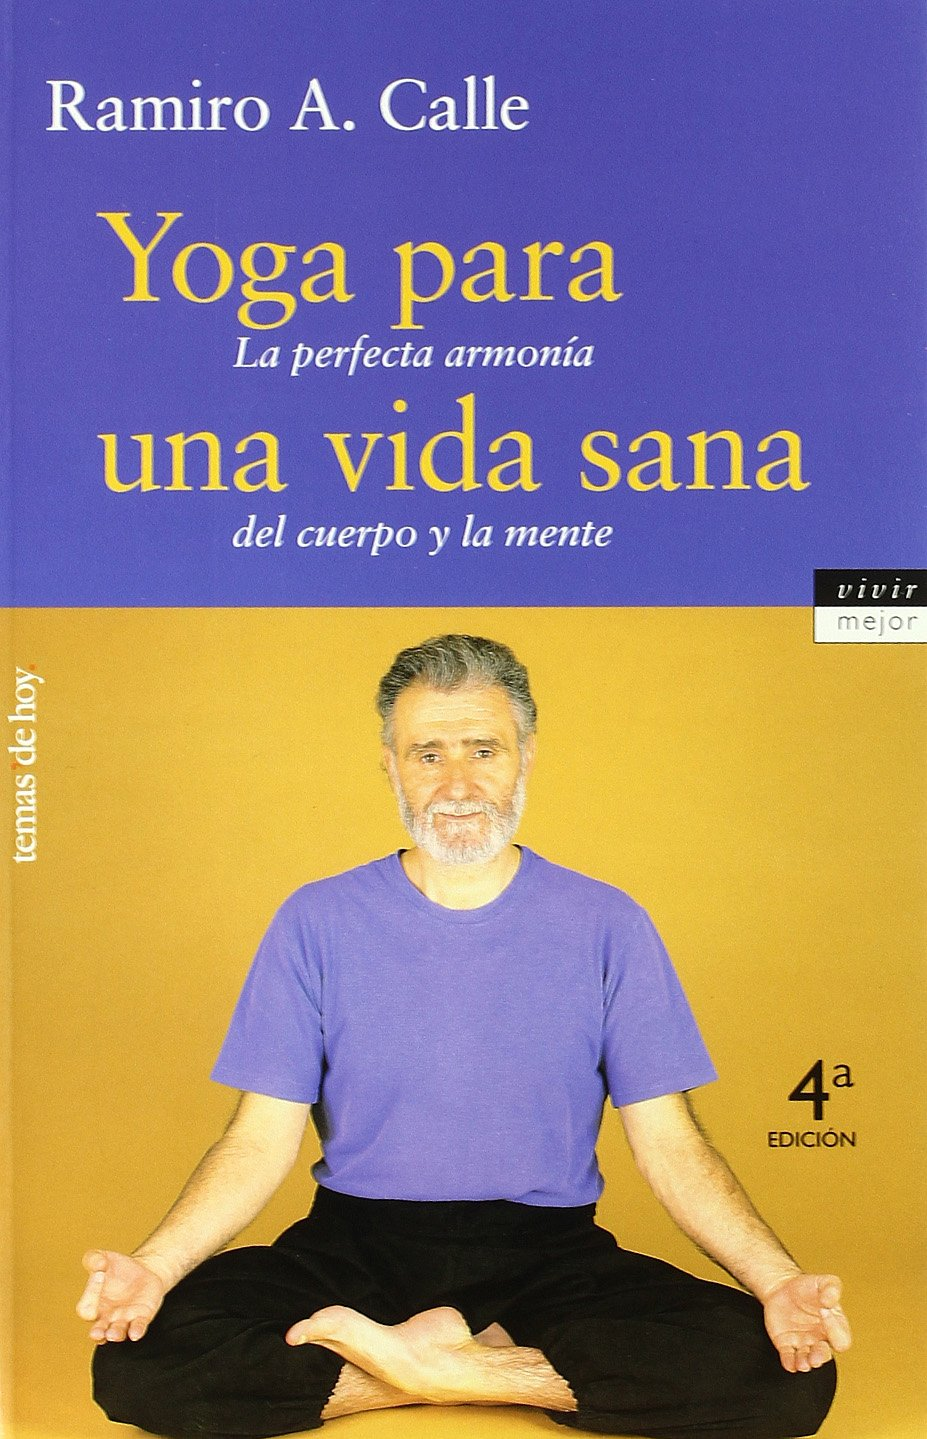 Amazon.com: Yoga para una vida sana (9788484600305): Ramiro ...